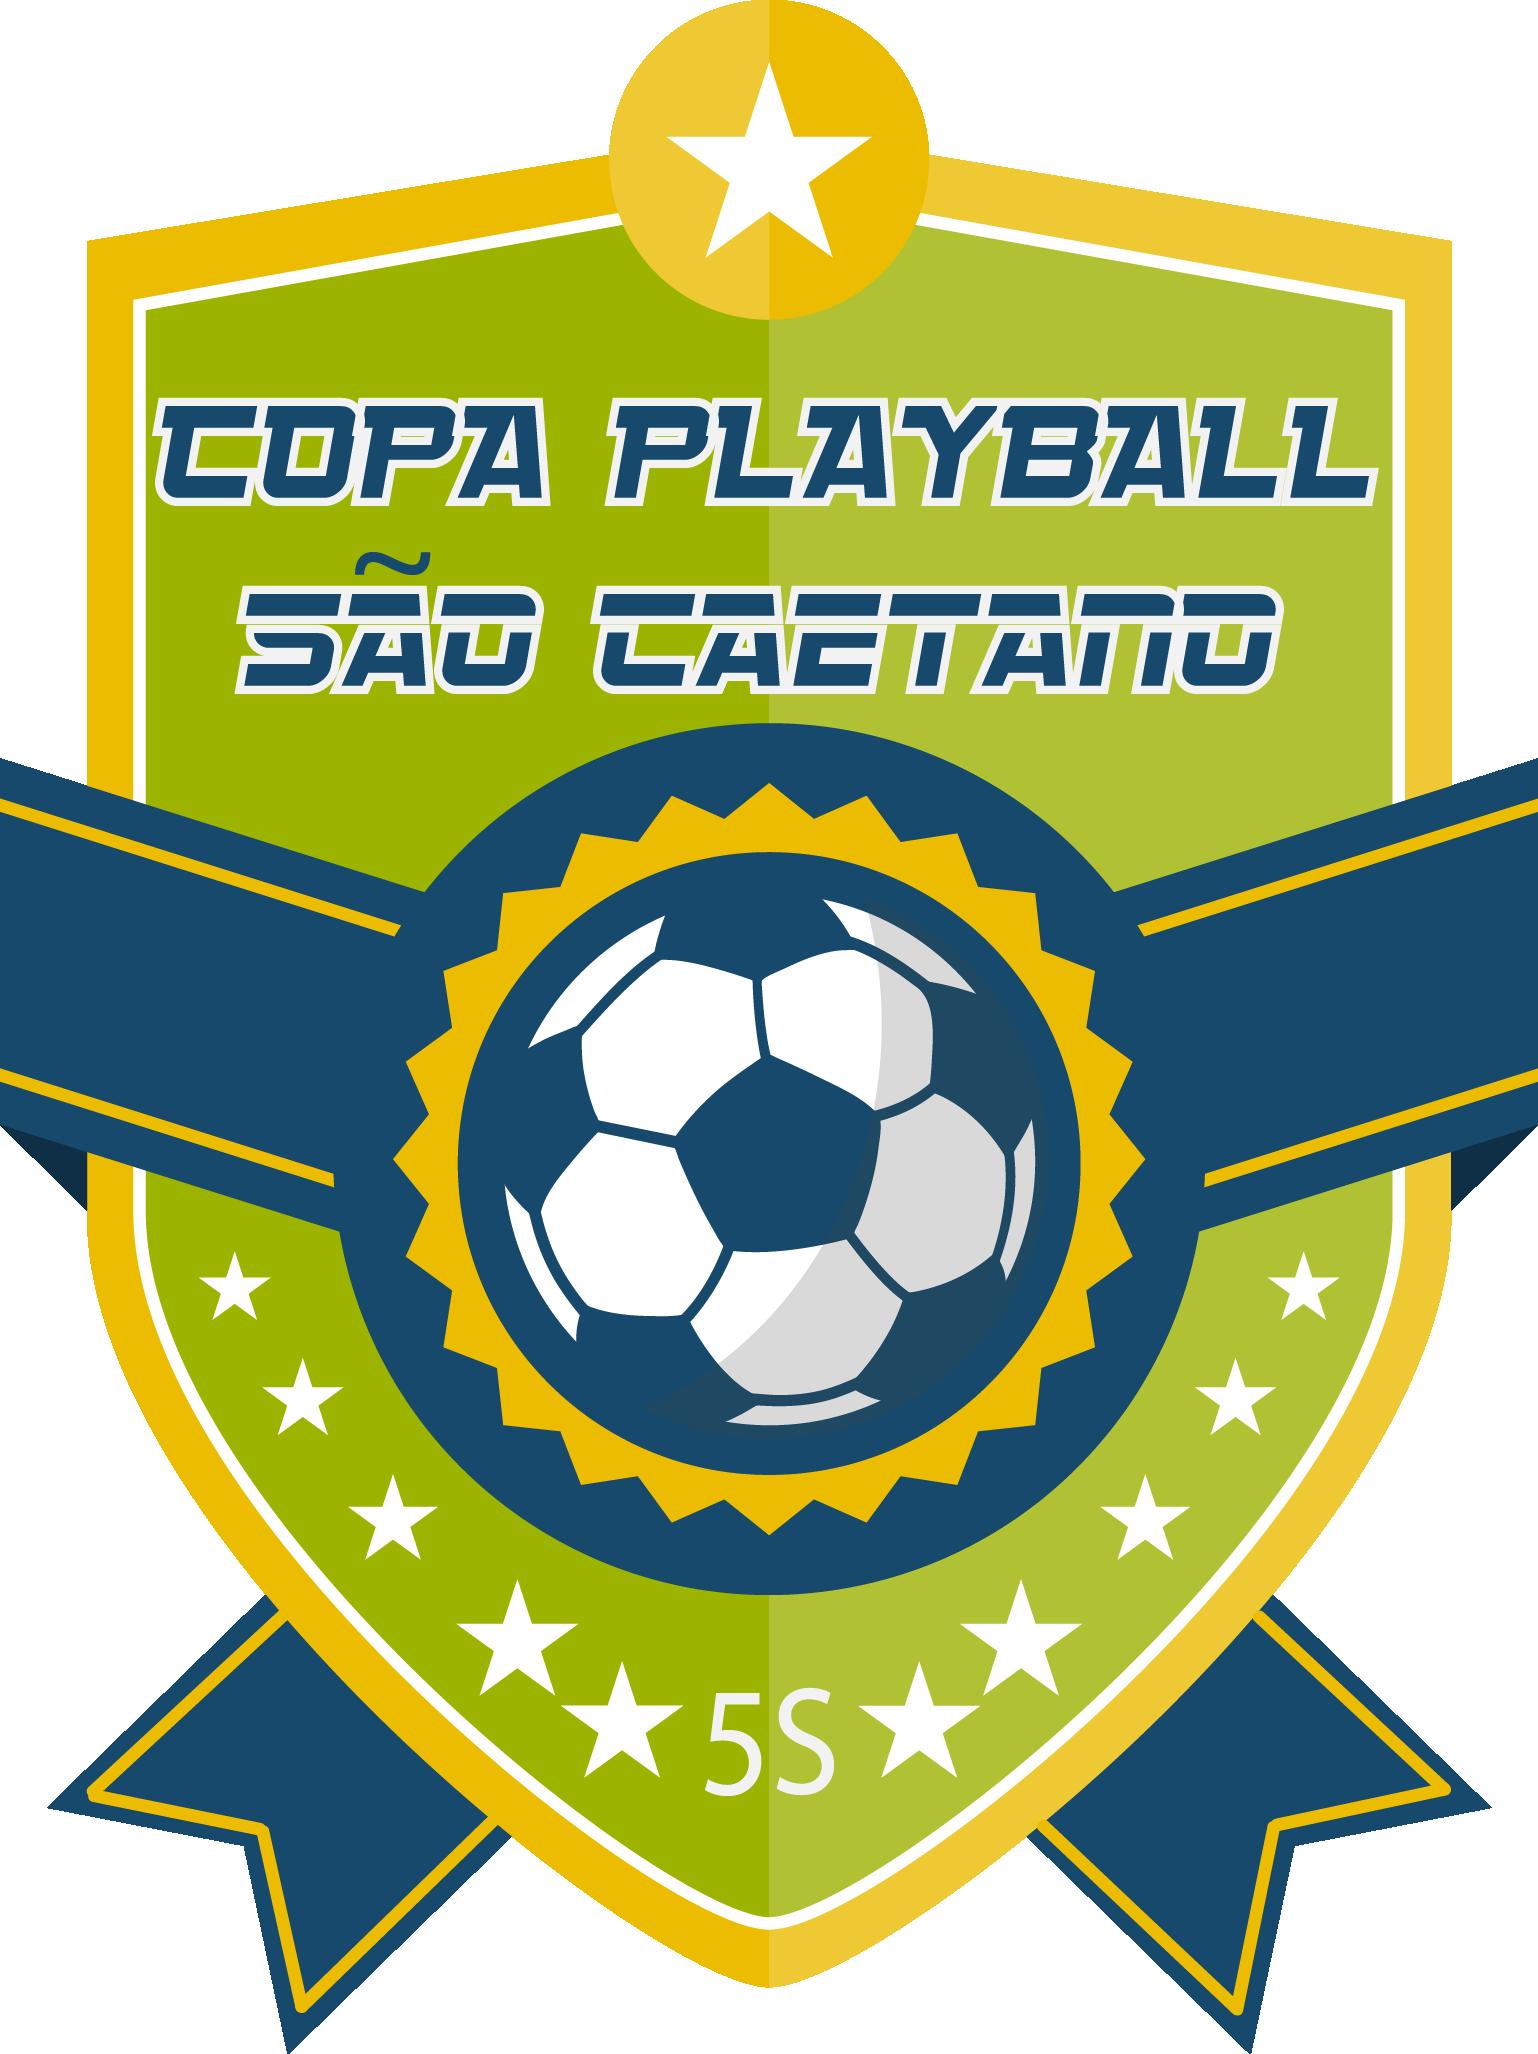 VIII Copa Playball São caetano Série B